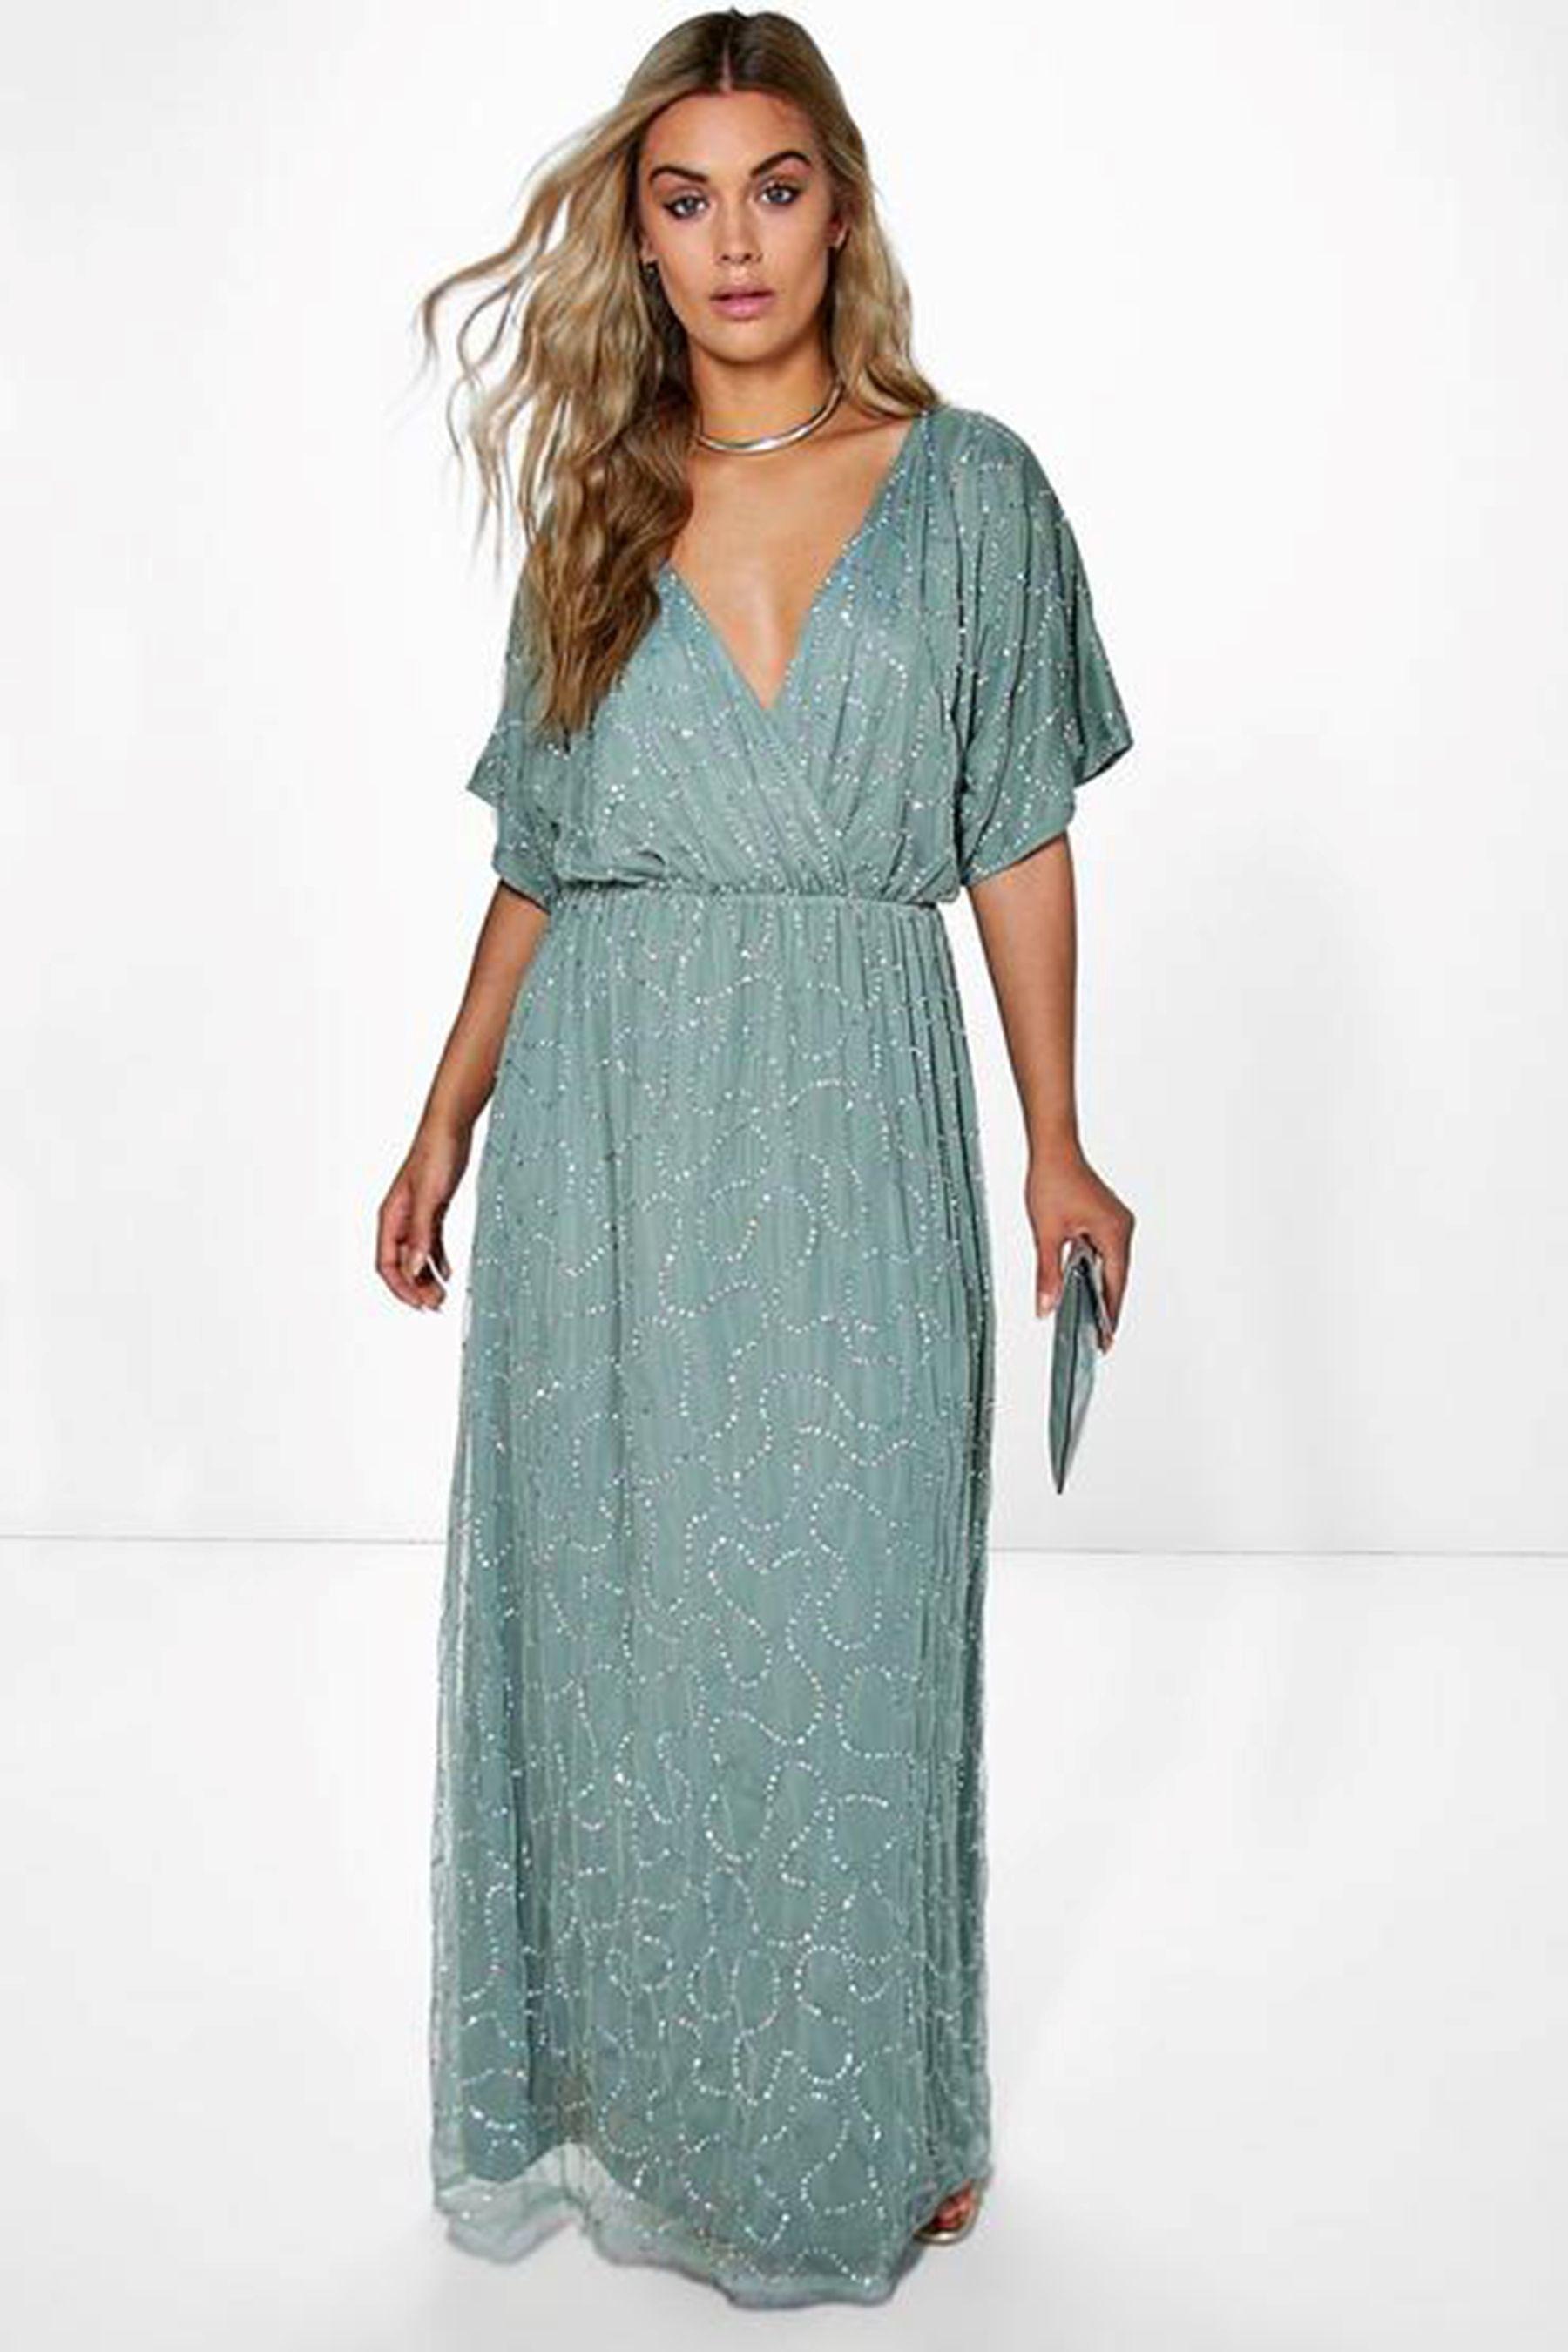 Boohoo Wedding Guest Dresses Plus Size – DACC